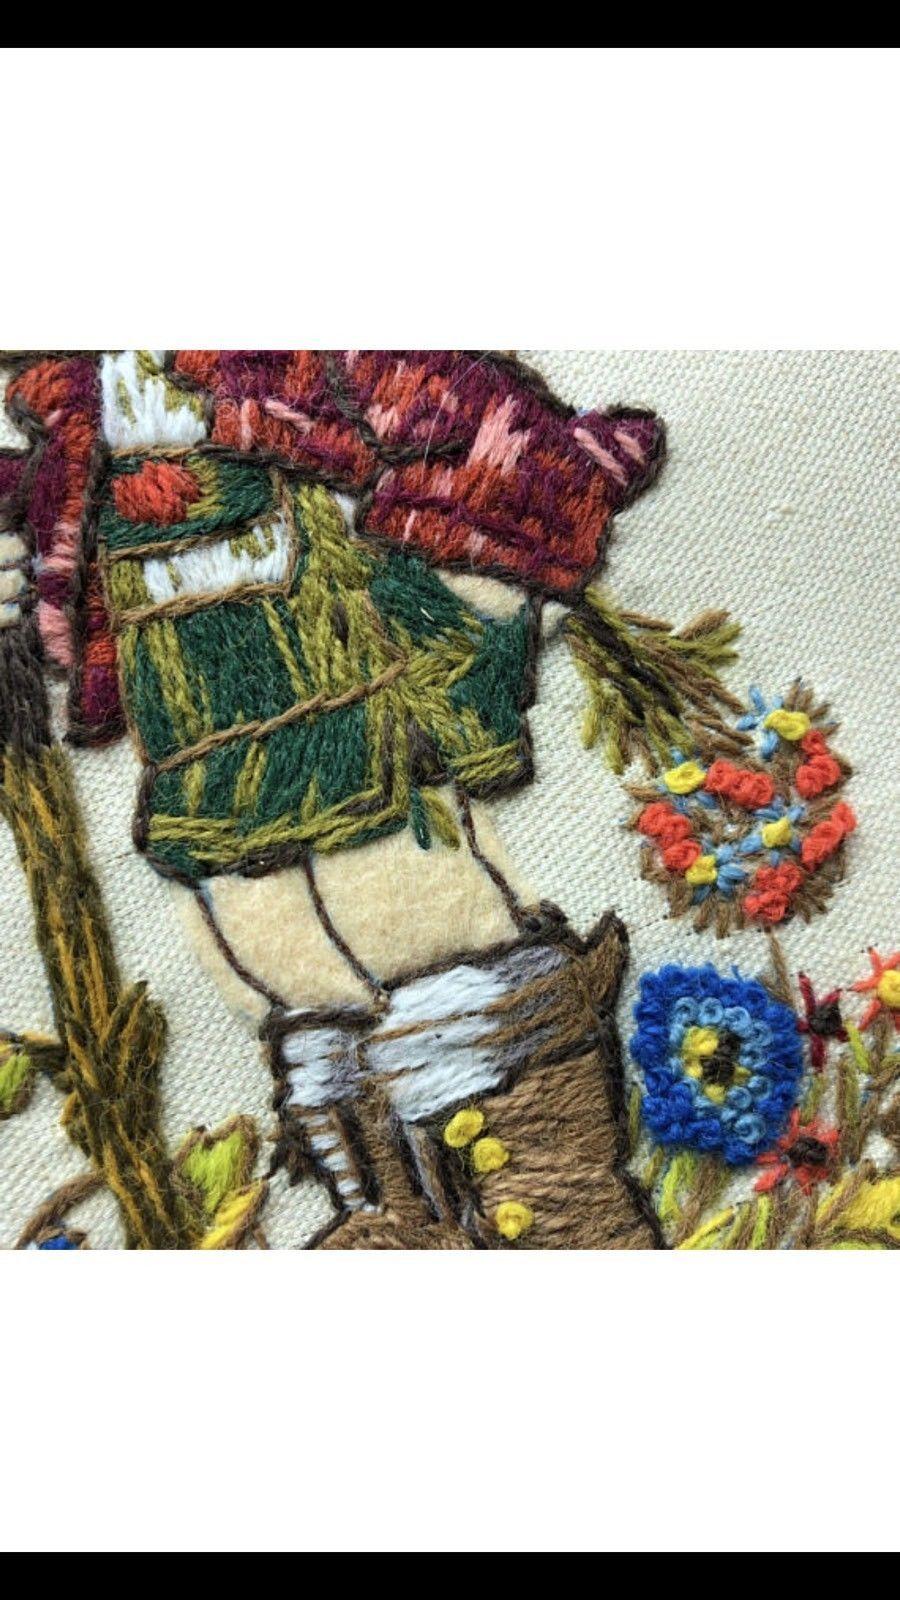 HUMMEL CROSS STITCH Peasant boy wall hanging 1980 picture frame W Germany goebel